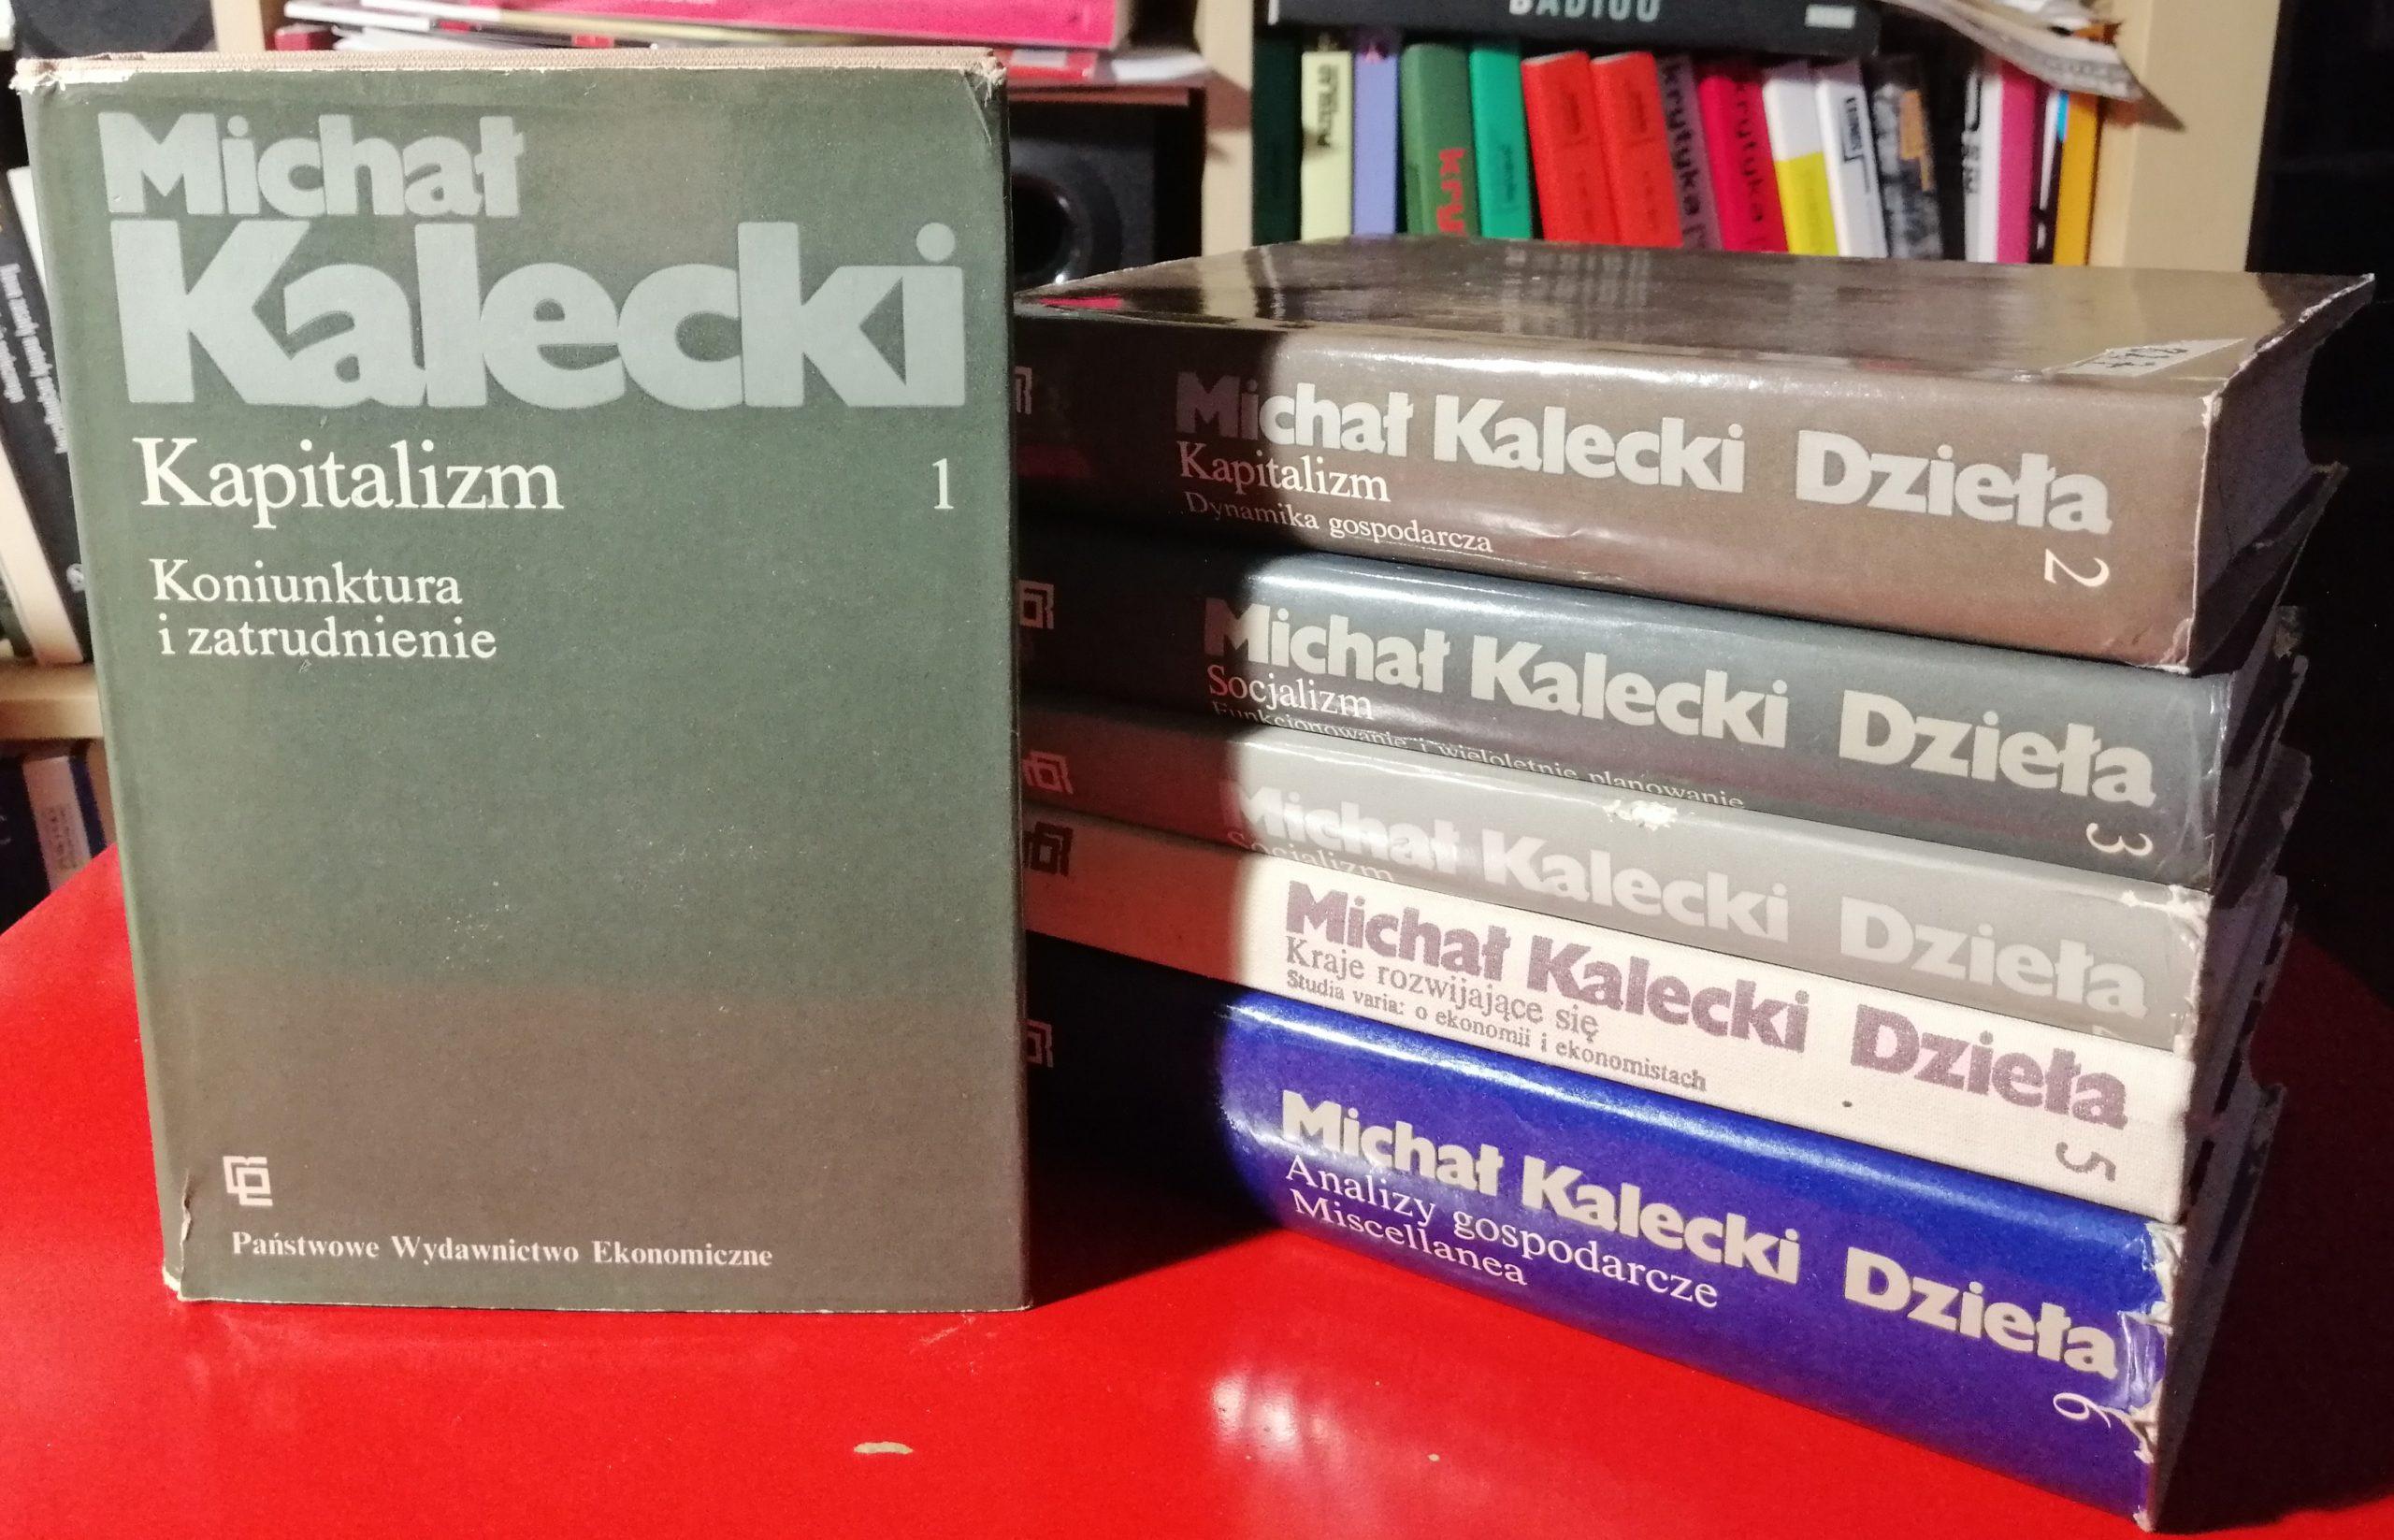 phot_kalecki_ksiazki